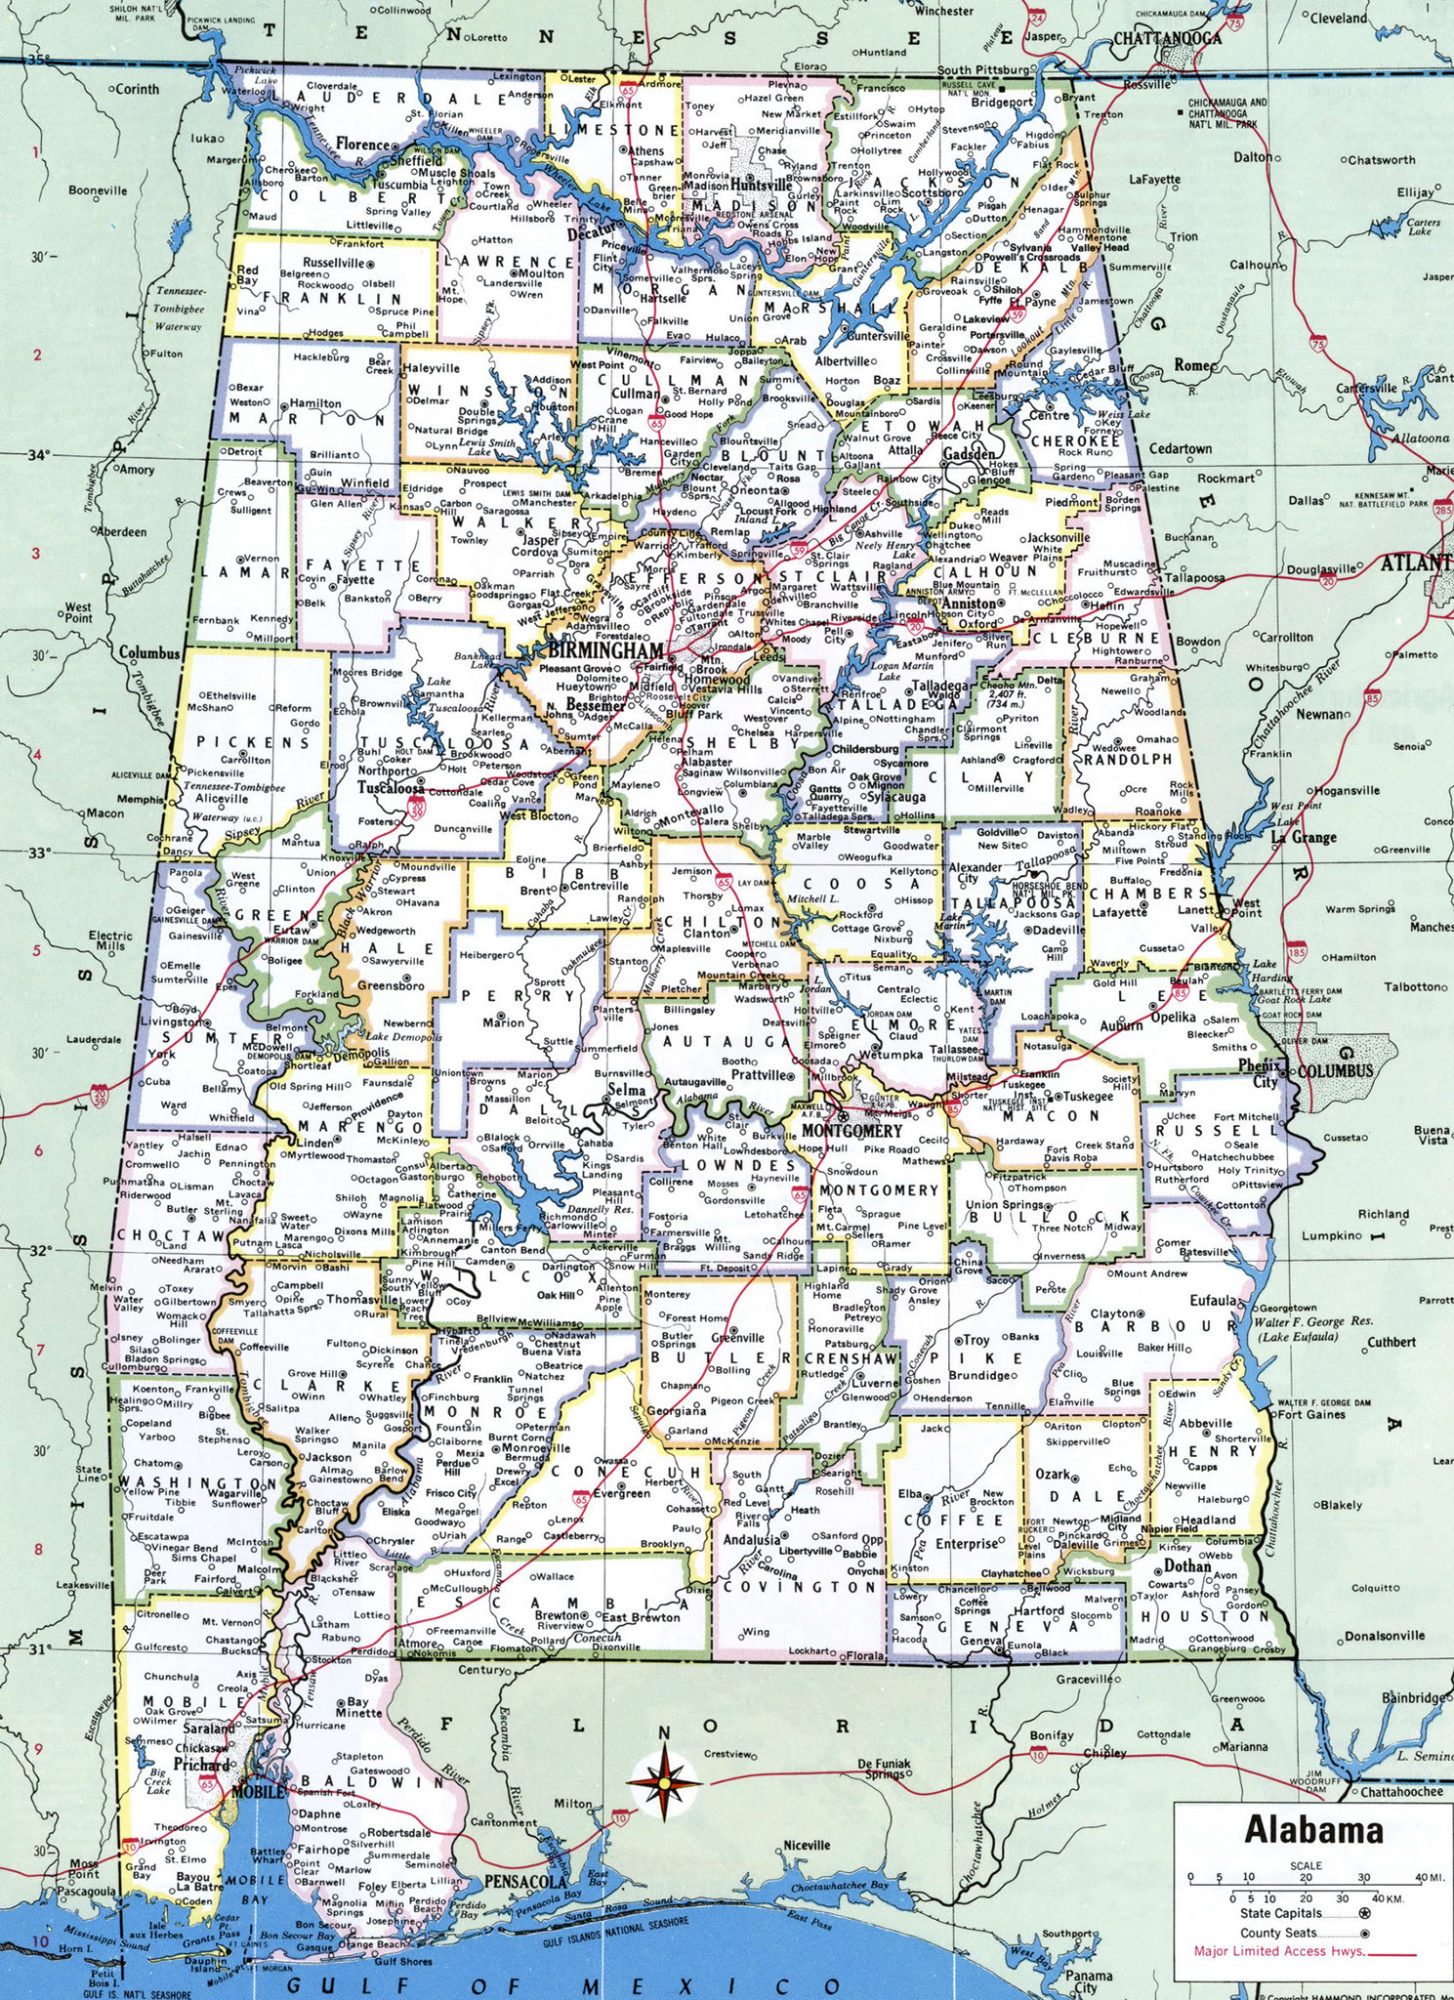 Alabama Large Political  Map   Political  Map of Alabama With Capital , city and River lake-5